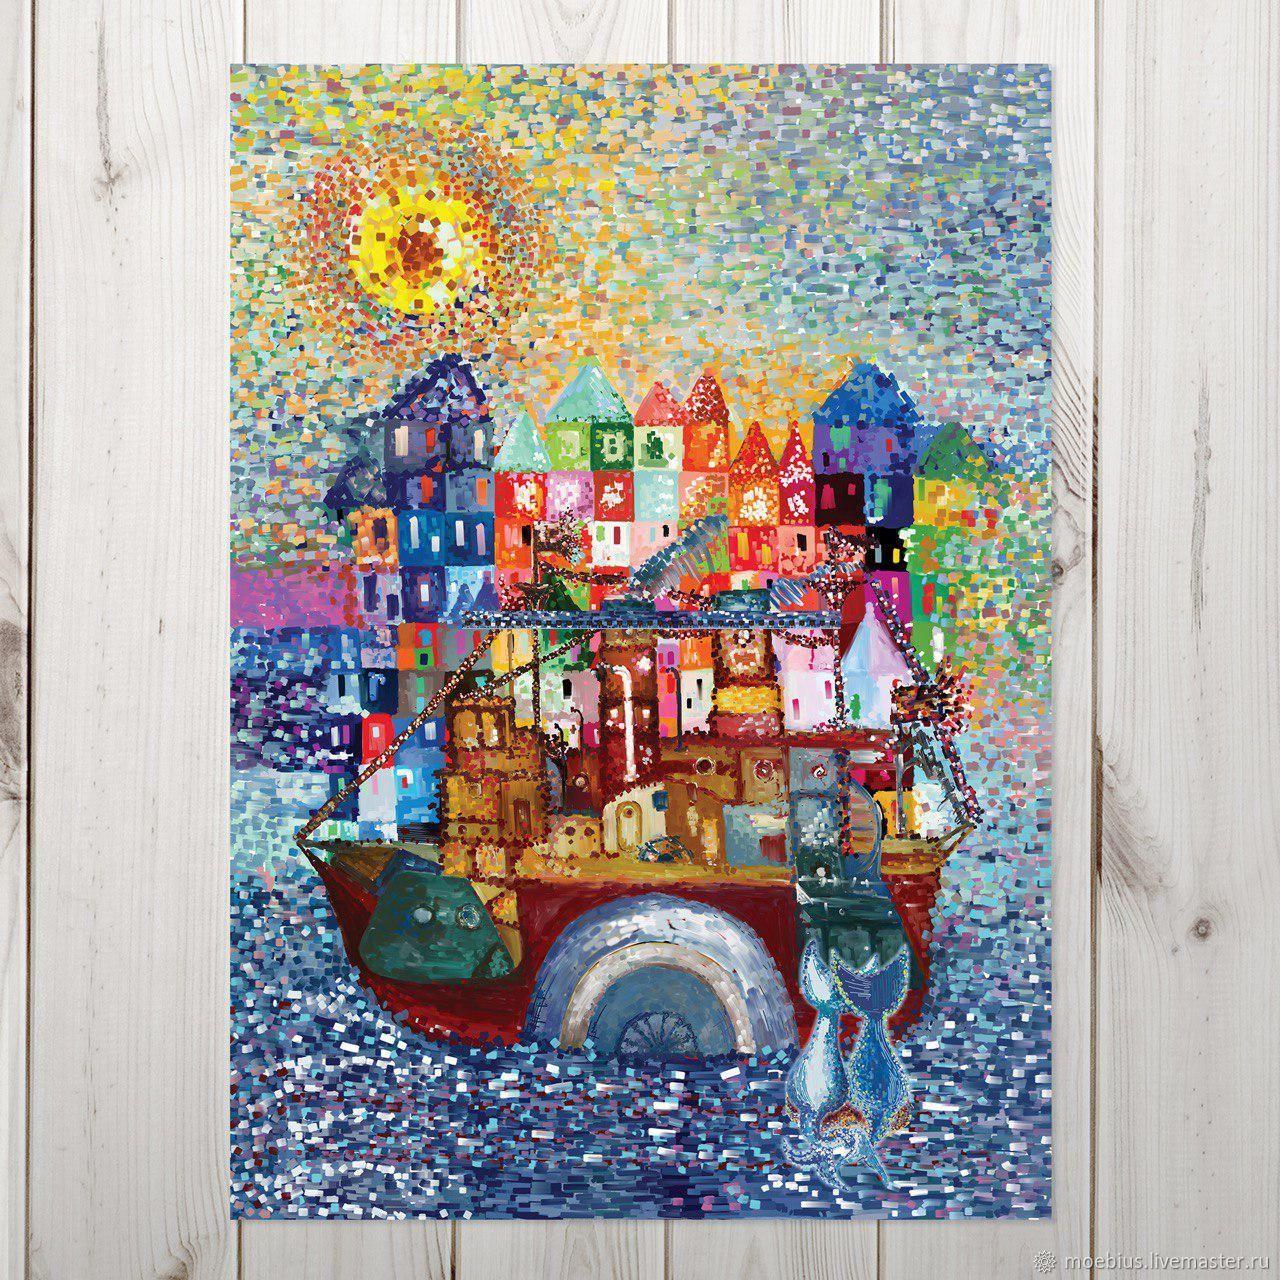 Кораблик. Календарь настенный на 2019 год, Календари, Москва, Фото №1